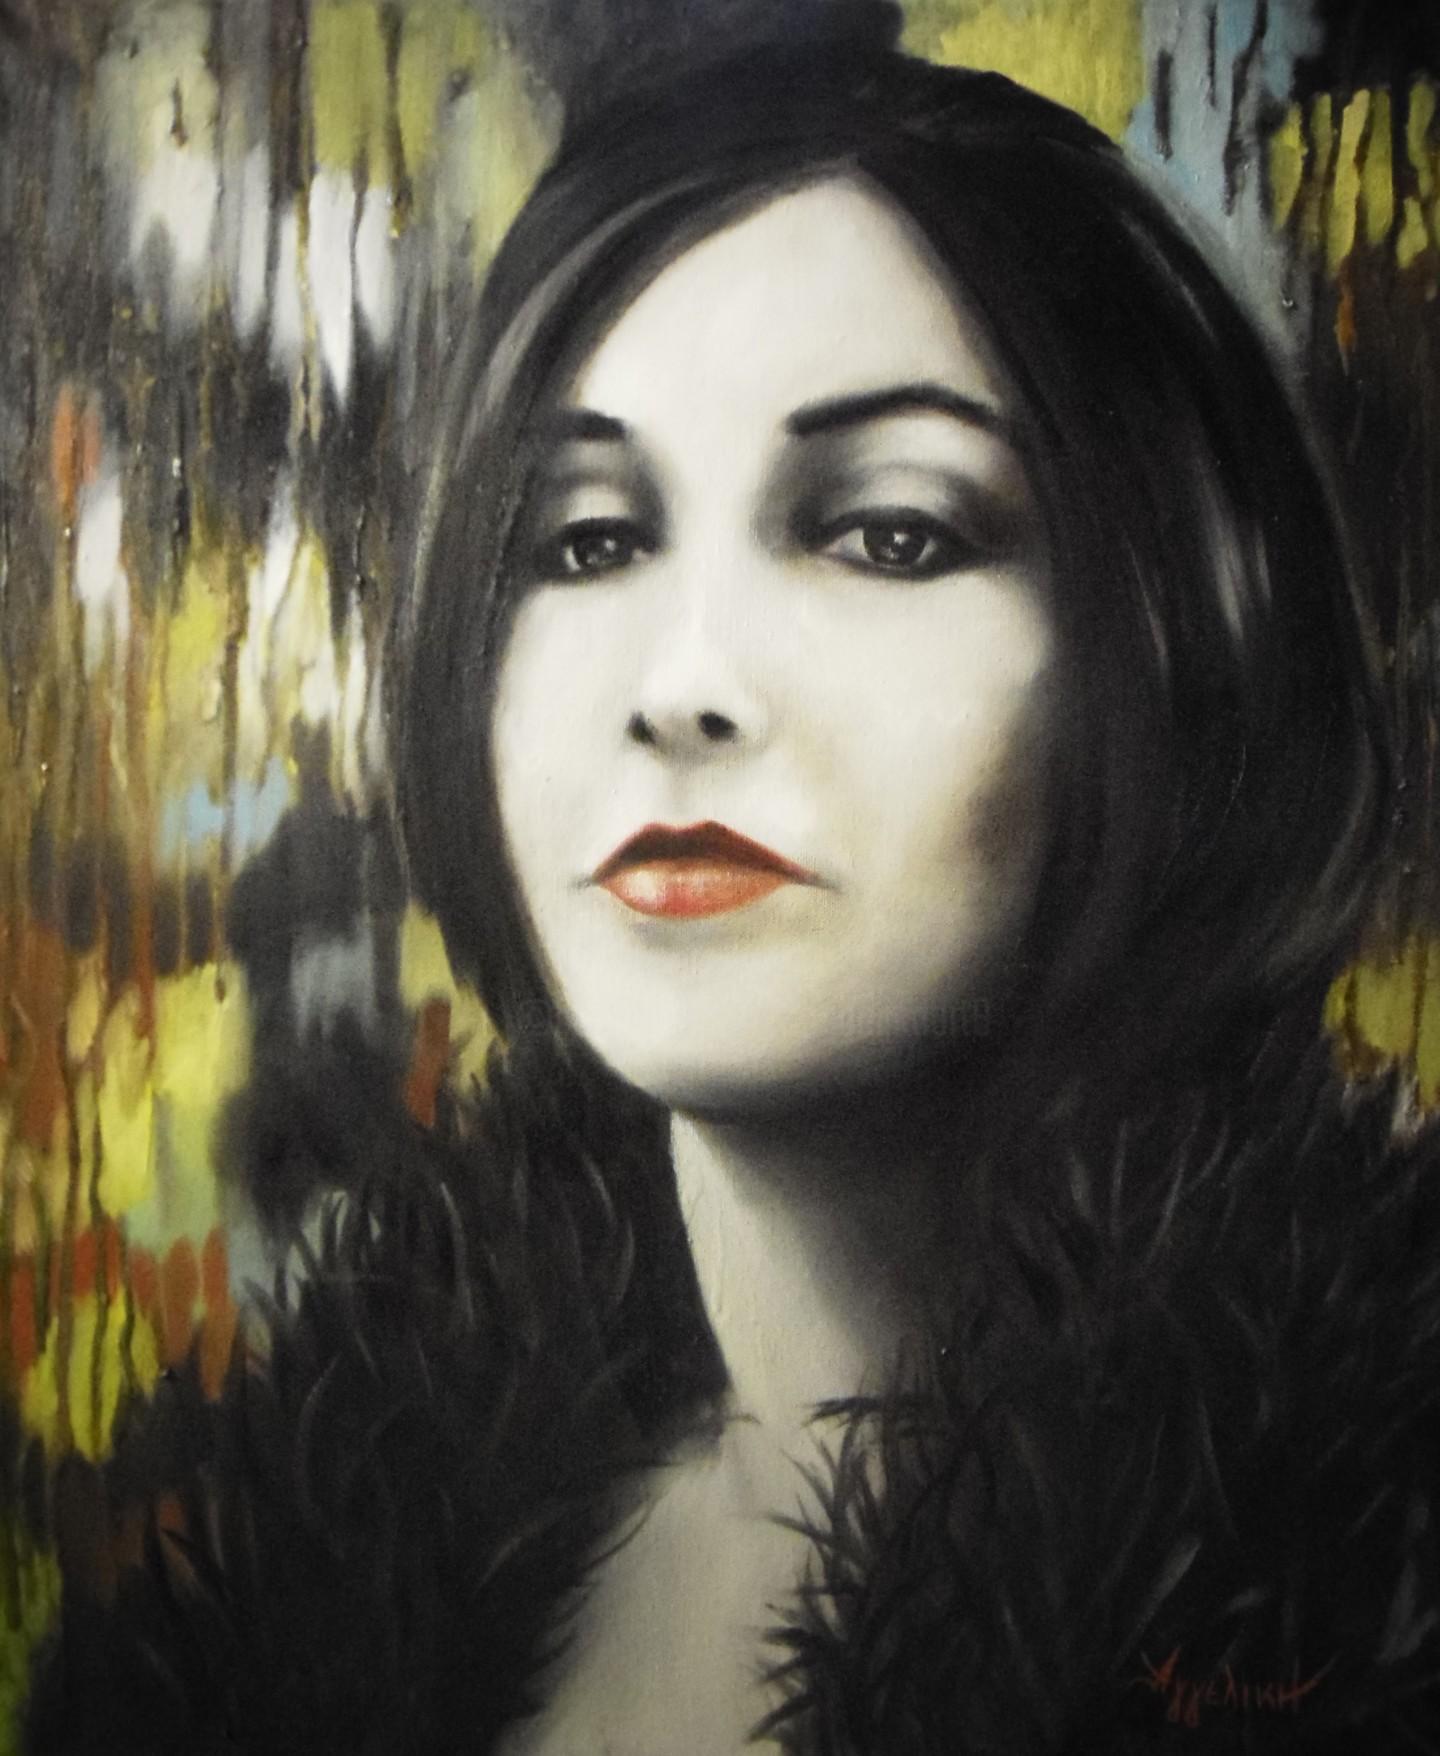 Ageliki [Αγγελικη] - White clown by Ageliki, 50X60cm, oil on canvas